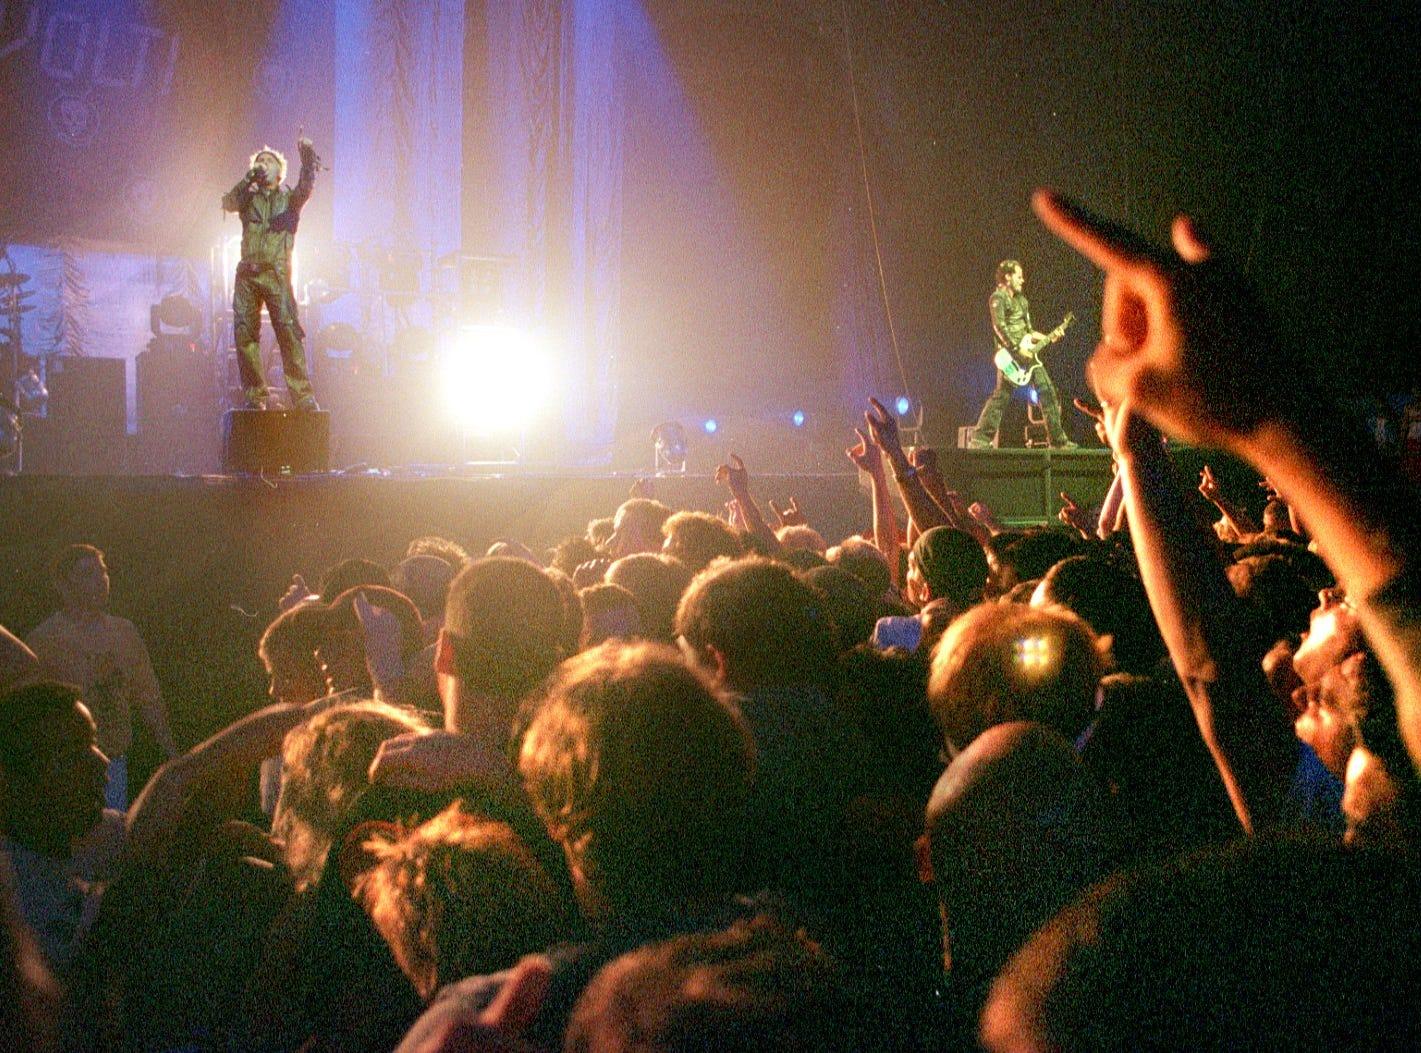 Fans cheer Powerman 5000 at Brown County Veterans Memorial Arena.  The band opened for Korn.